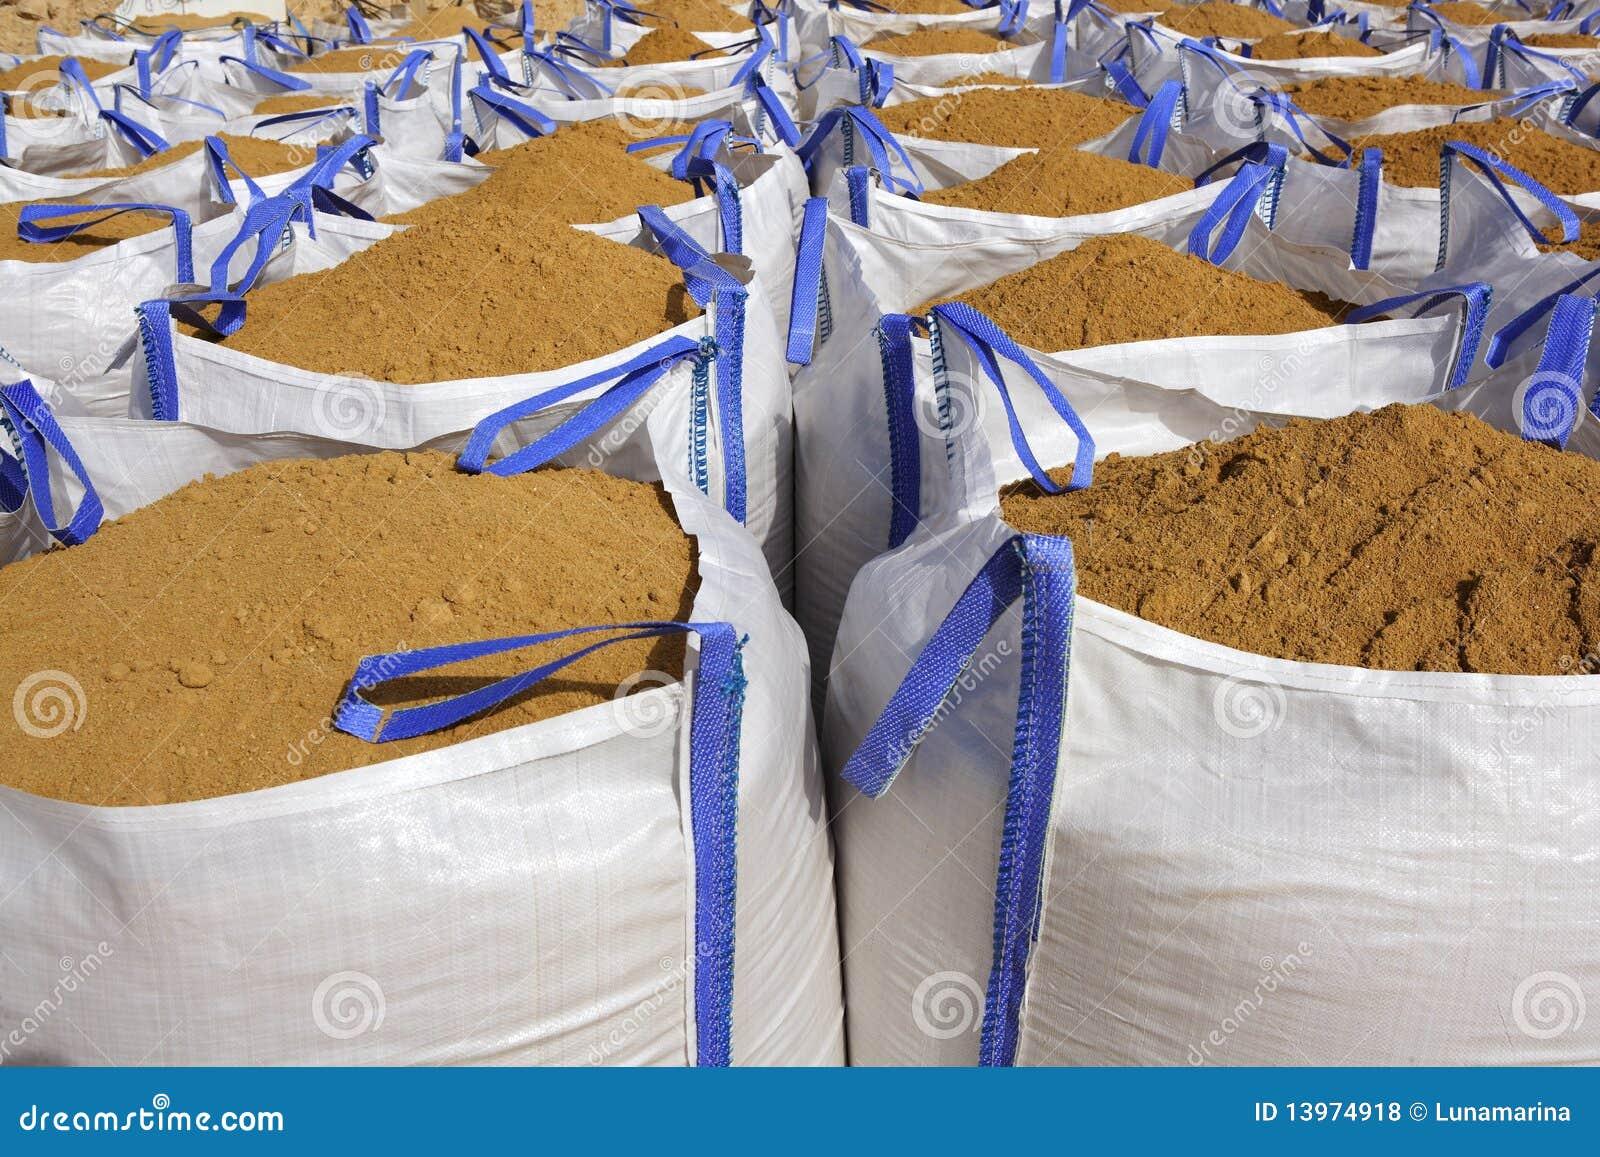 Sandbag White Big Bag Sand Sacks Quarry Royalty Free Stock ...